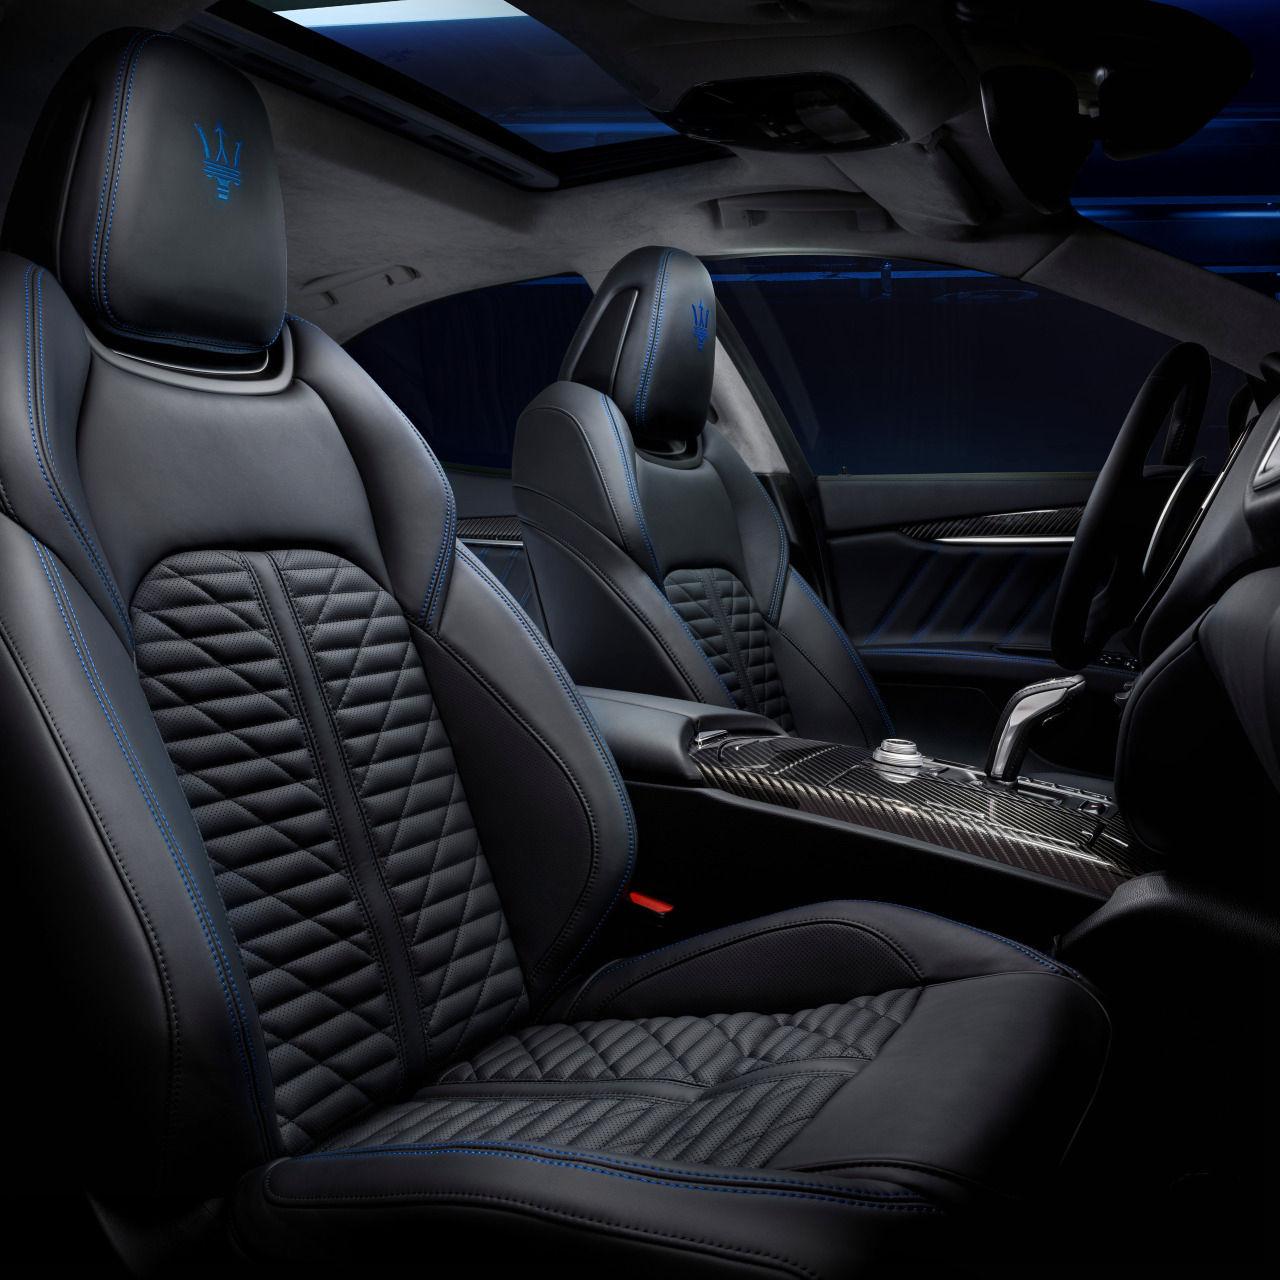 Maserati Ghibli - Design - Interieur - Vordersitze